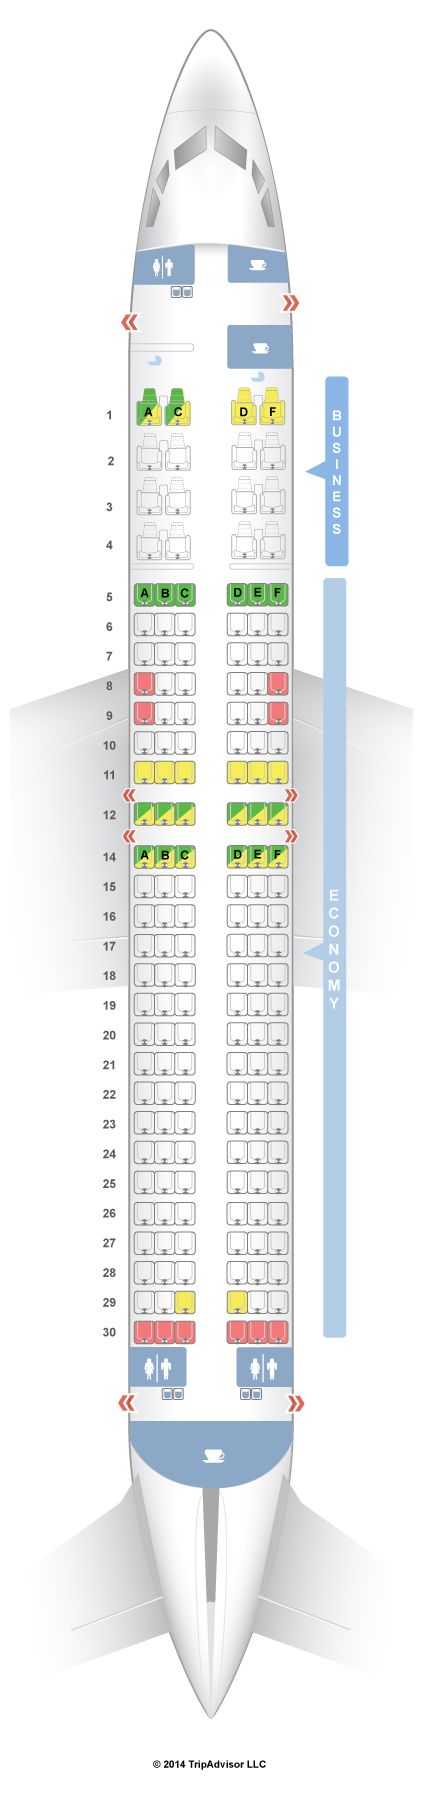 SeatGuru Seat Map Malaysia Airlines Boeing 737-800 (738) V1 ... on